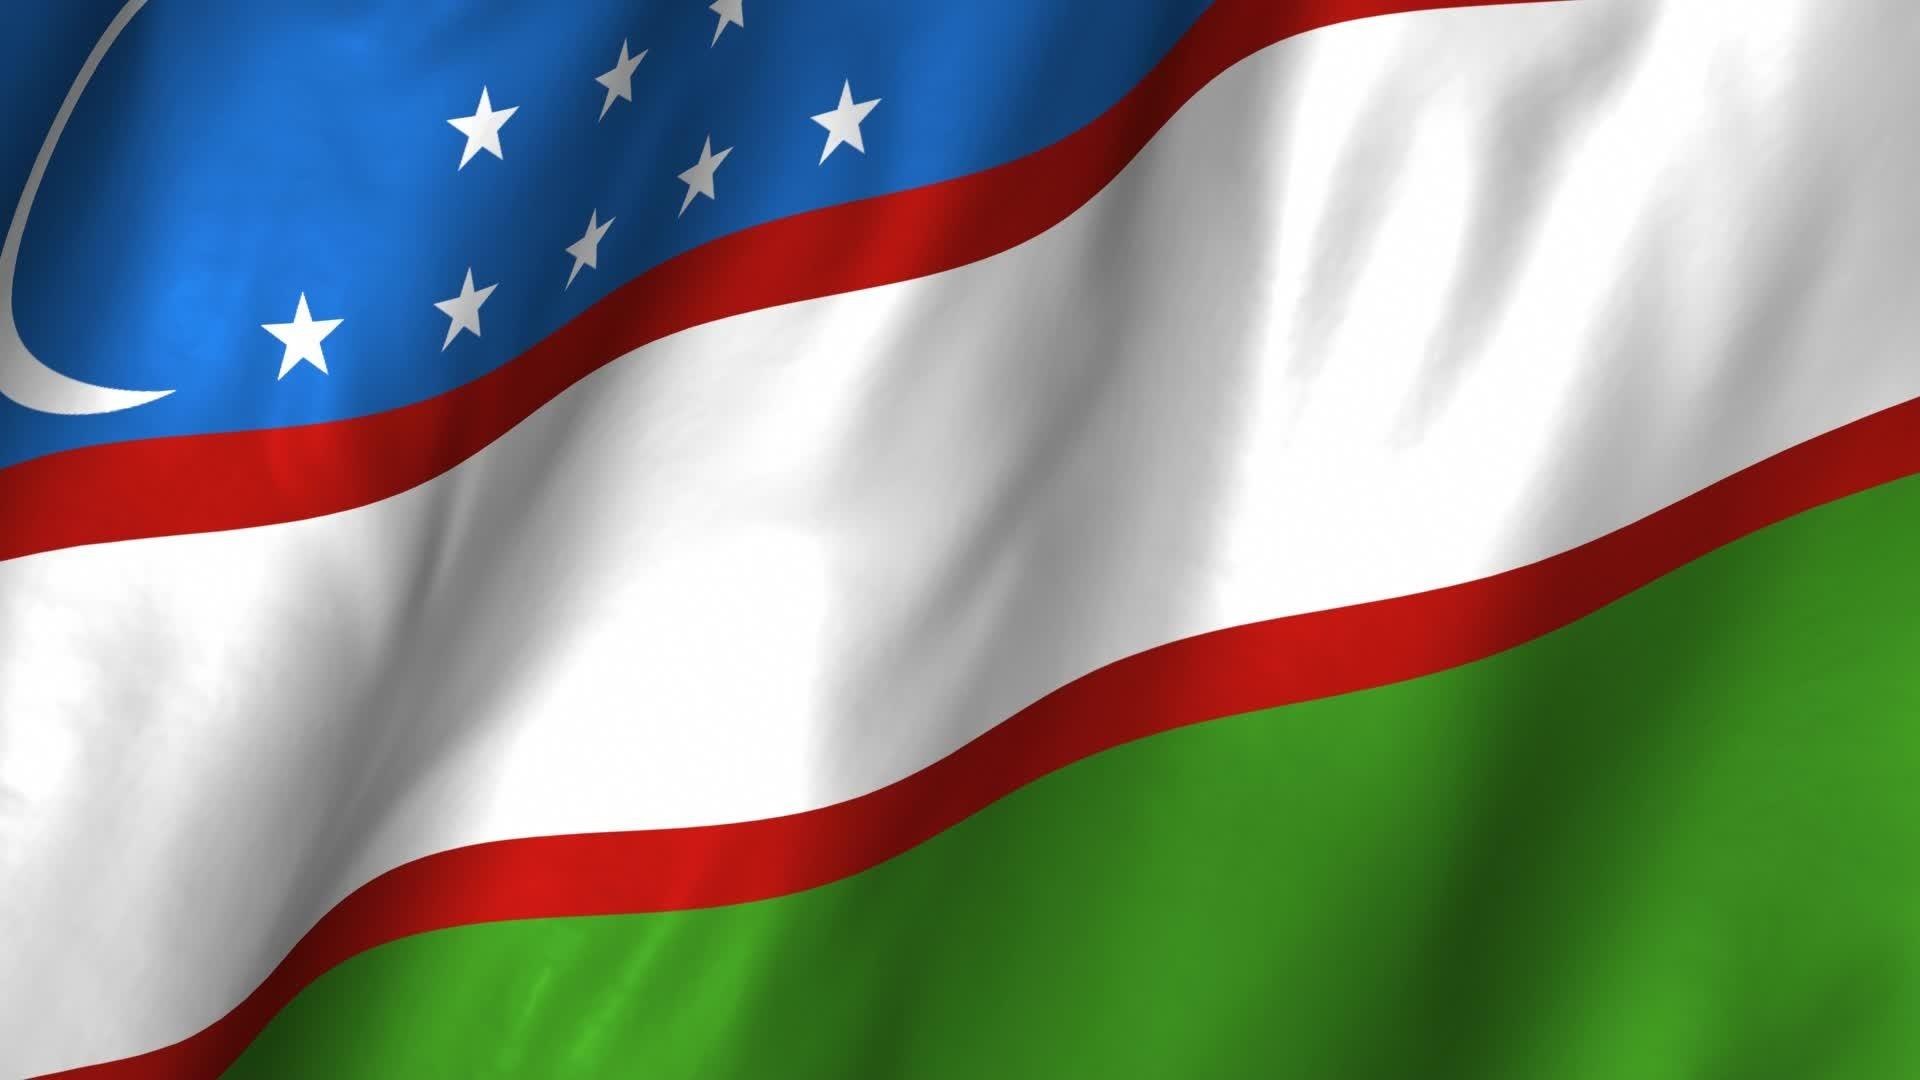 Flag of Uzbekistan wallpaper